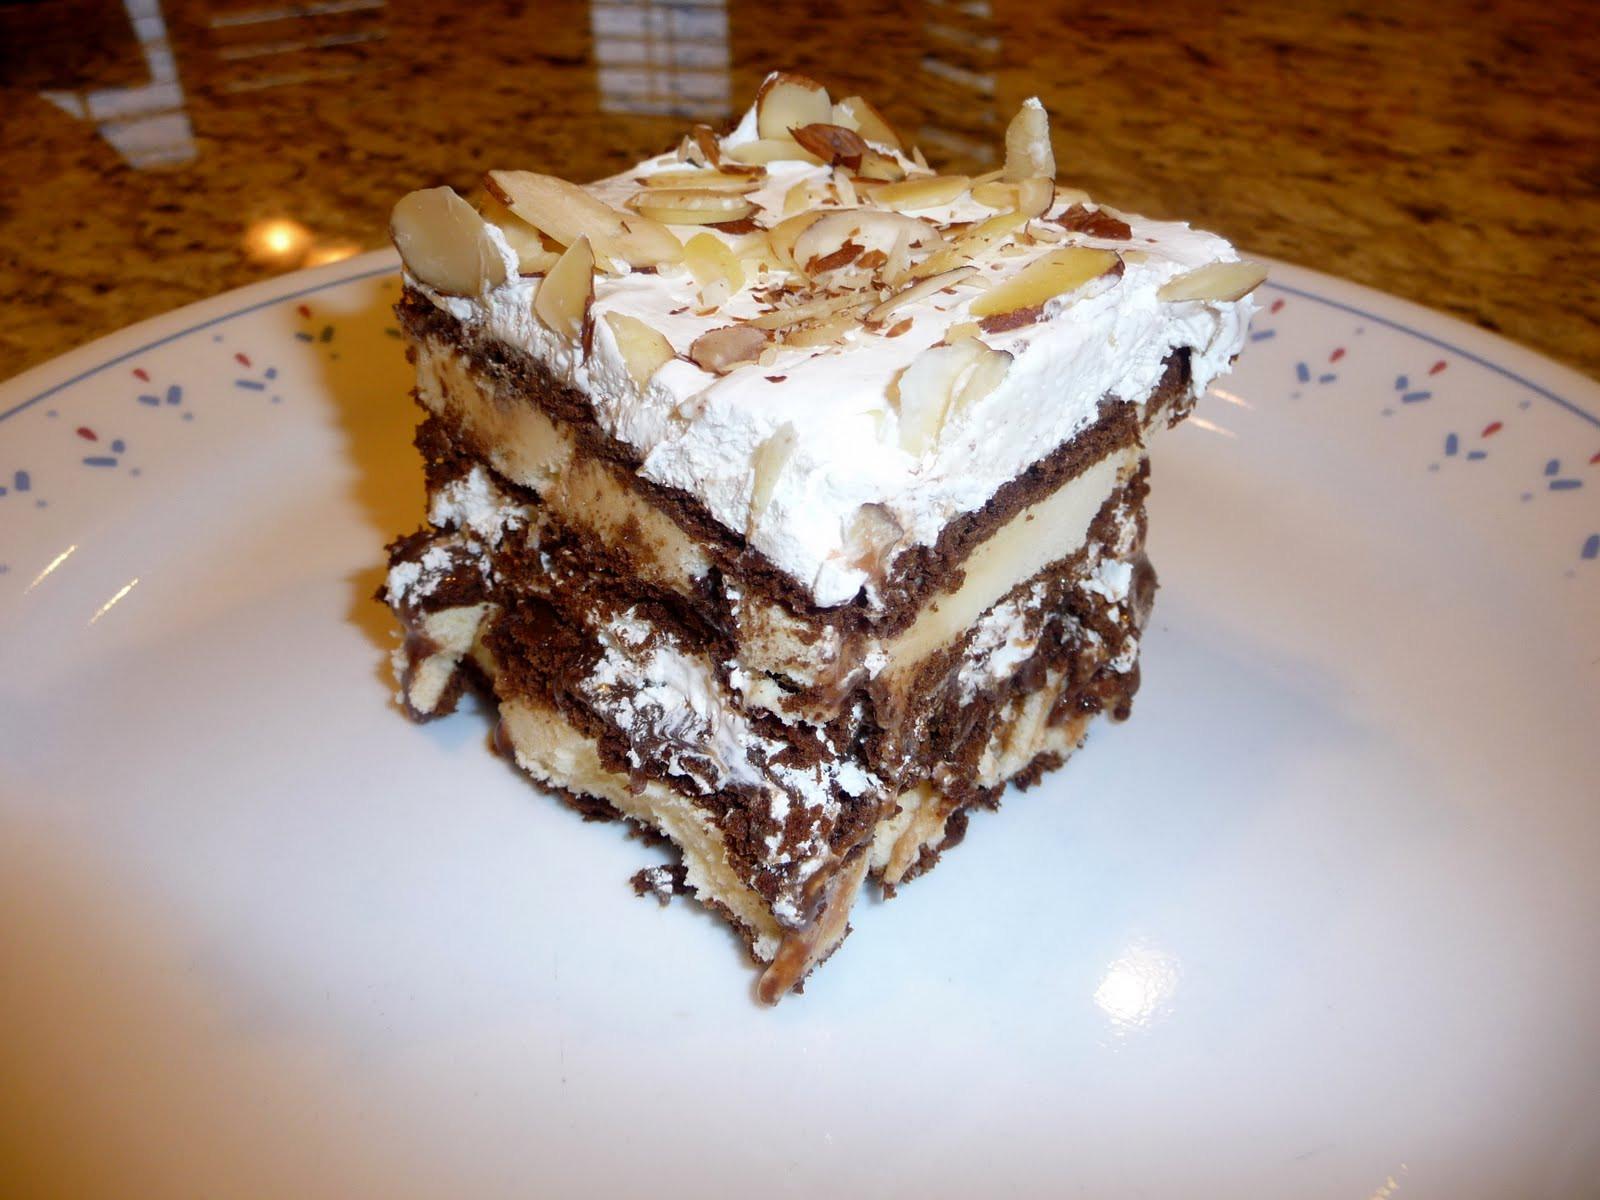 Ice Cream Sandwich Desserts Recipes  Ice Cream Sandwich Dessert Recipe Cool Whip